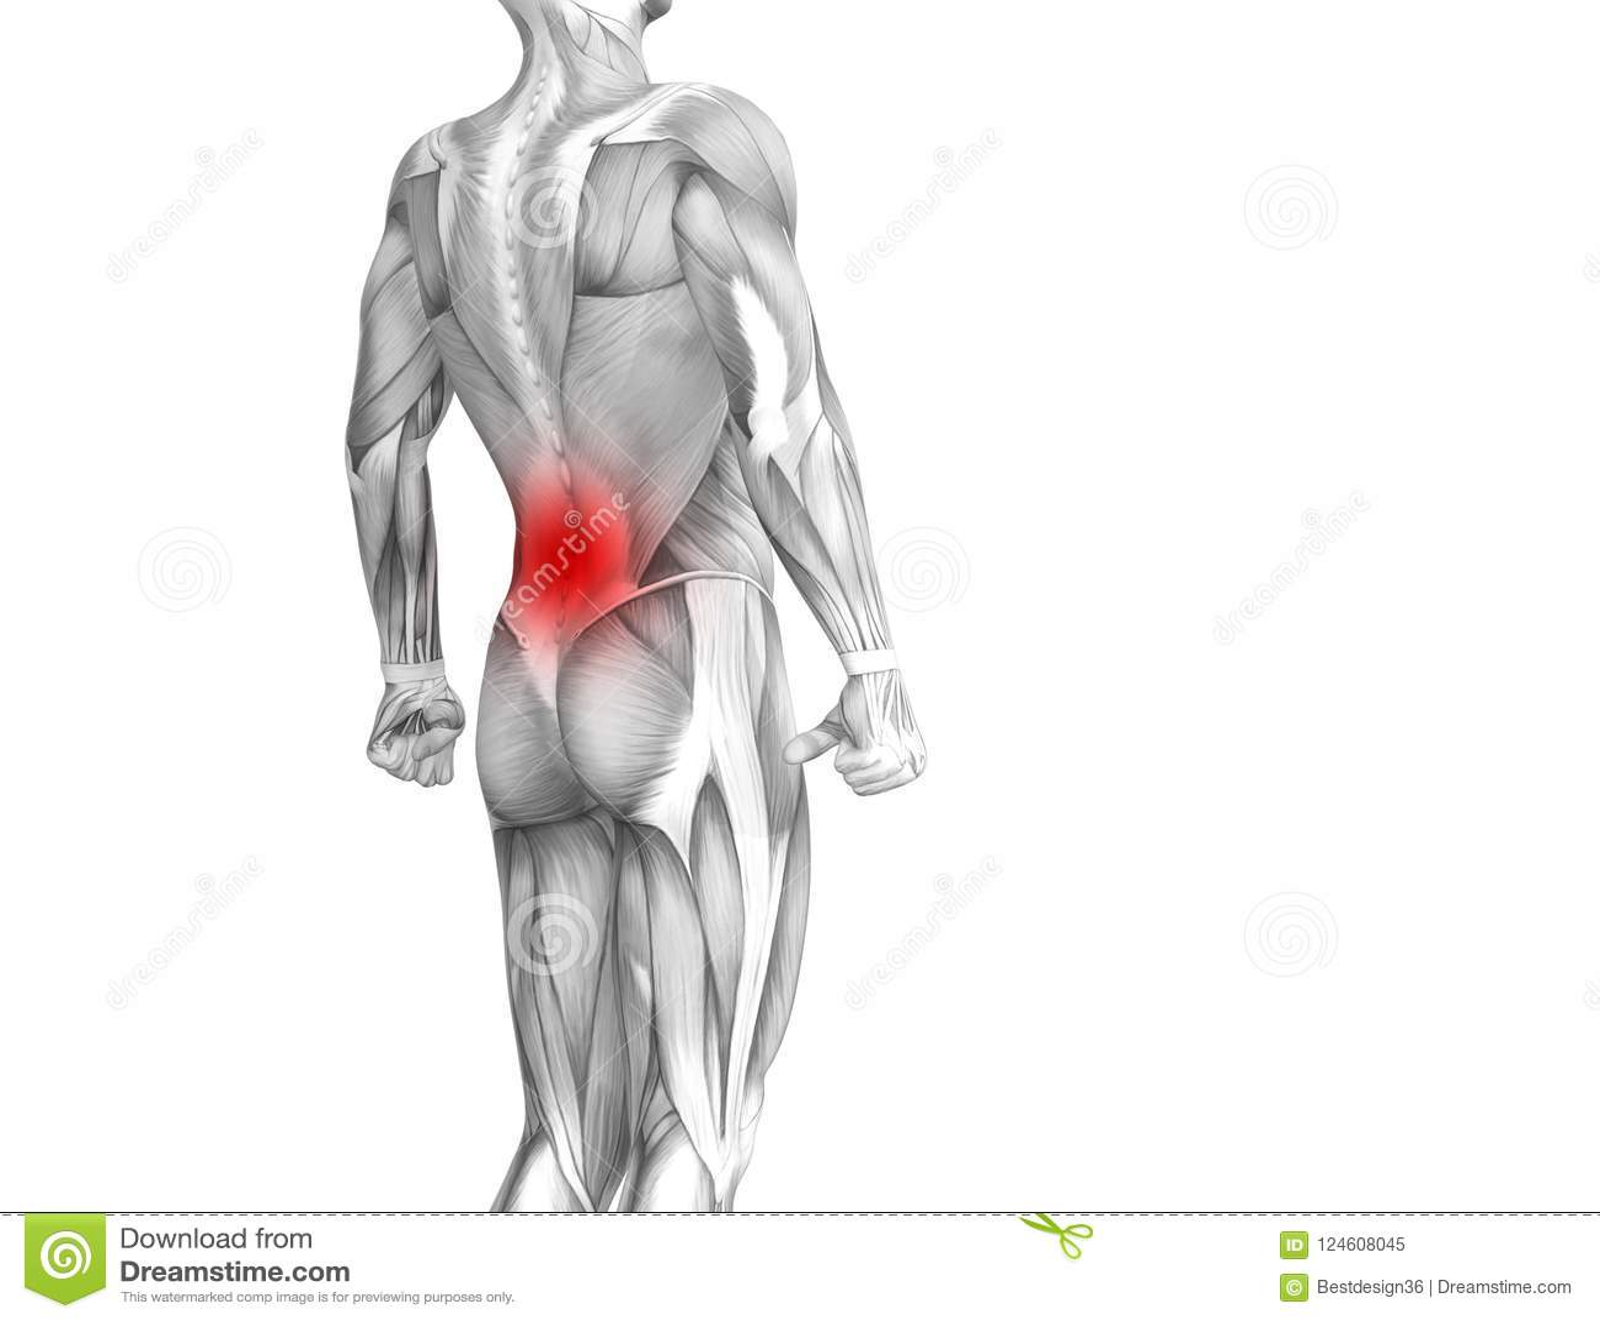 Back Human Anatomy Red Hot Spot Inflammation Stock Illustration